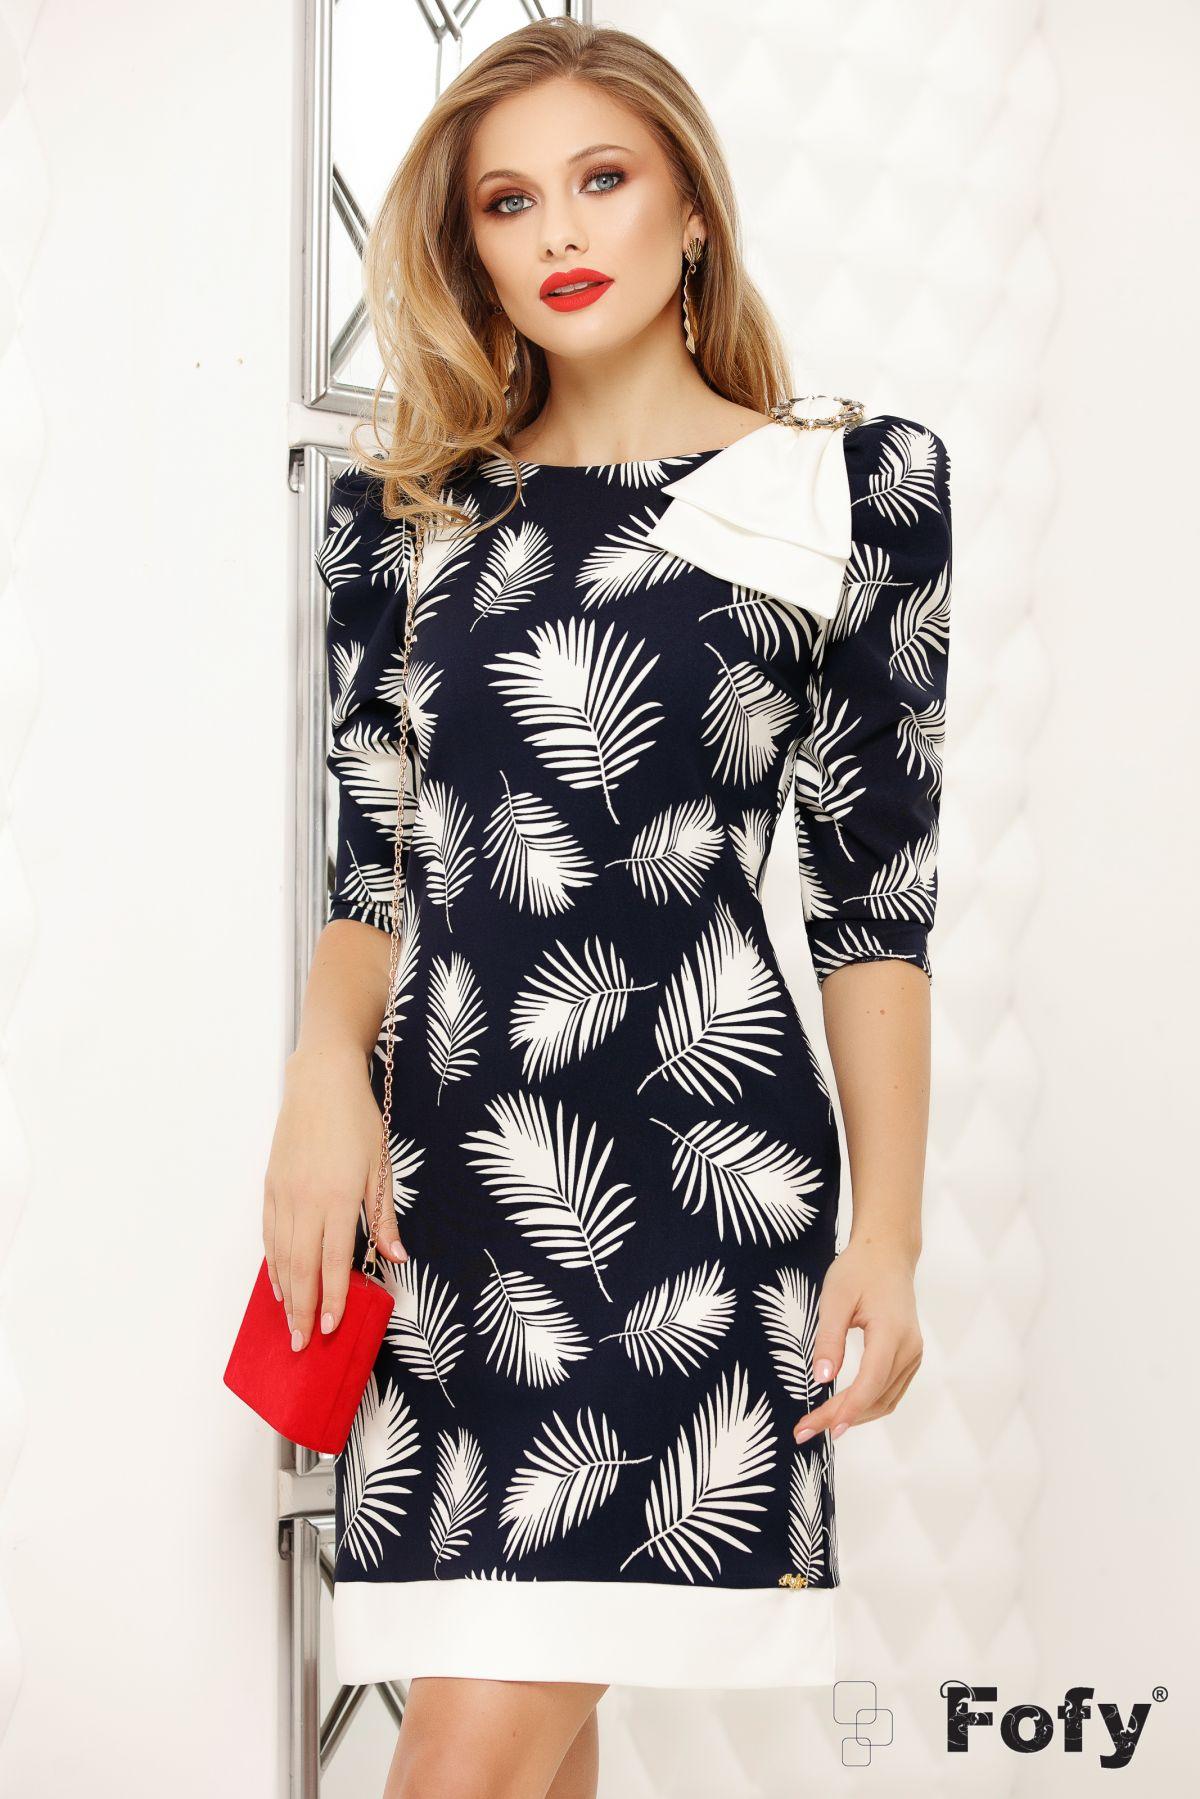 Rochie Fofy bleumarin cu imprimeu frunze stilizate